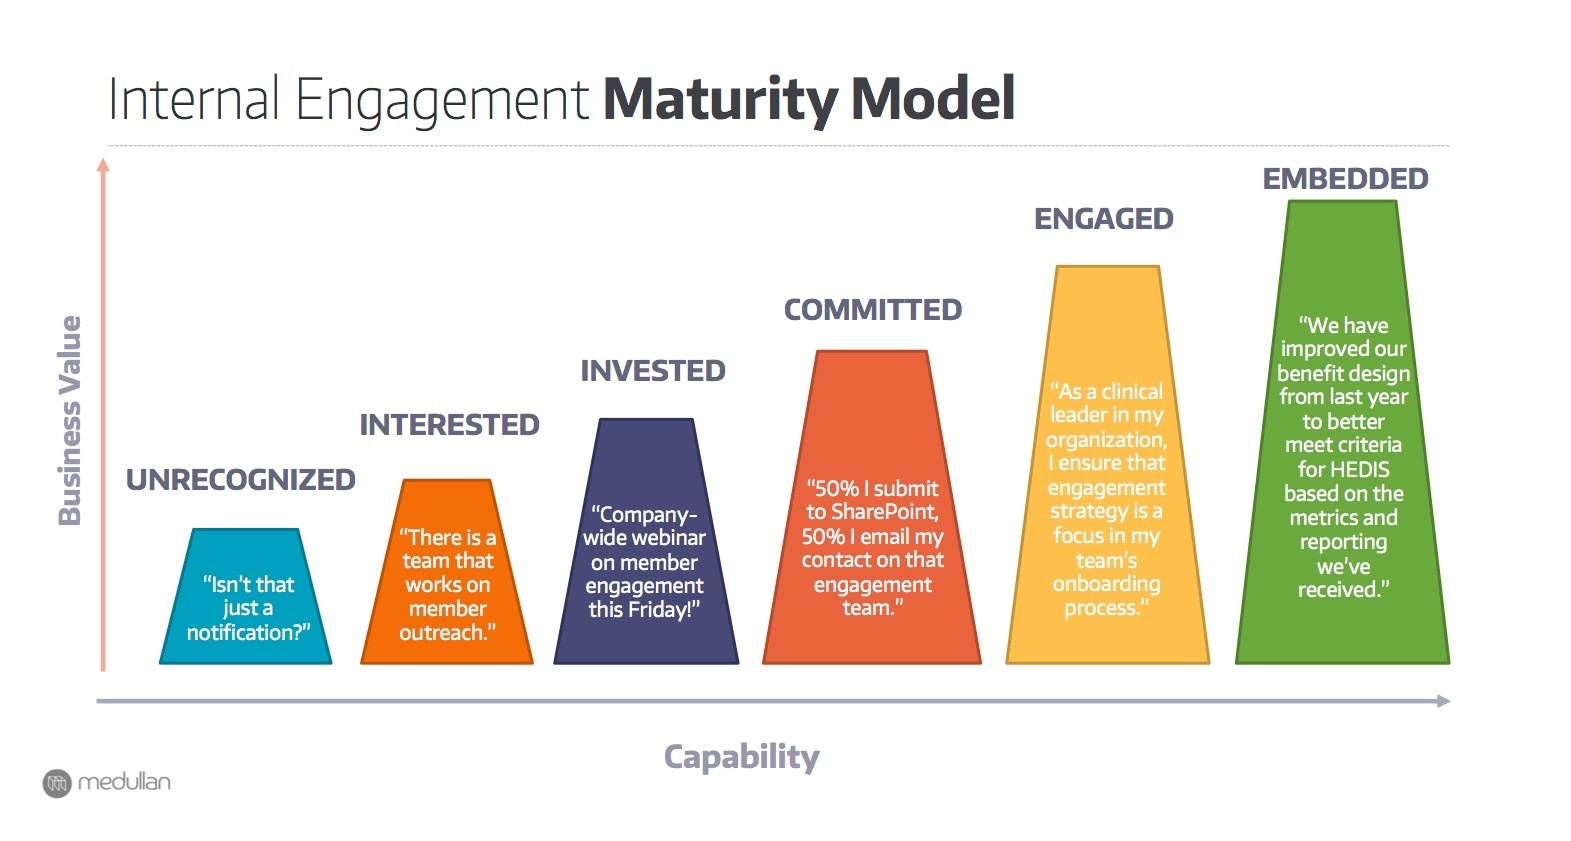 Internal Engagement Maturity Model